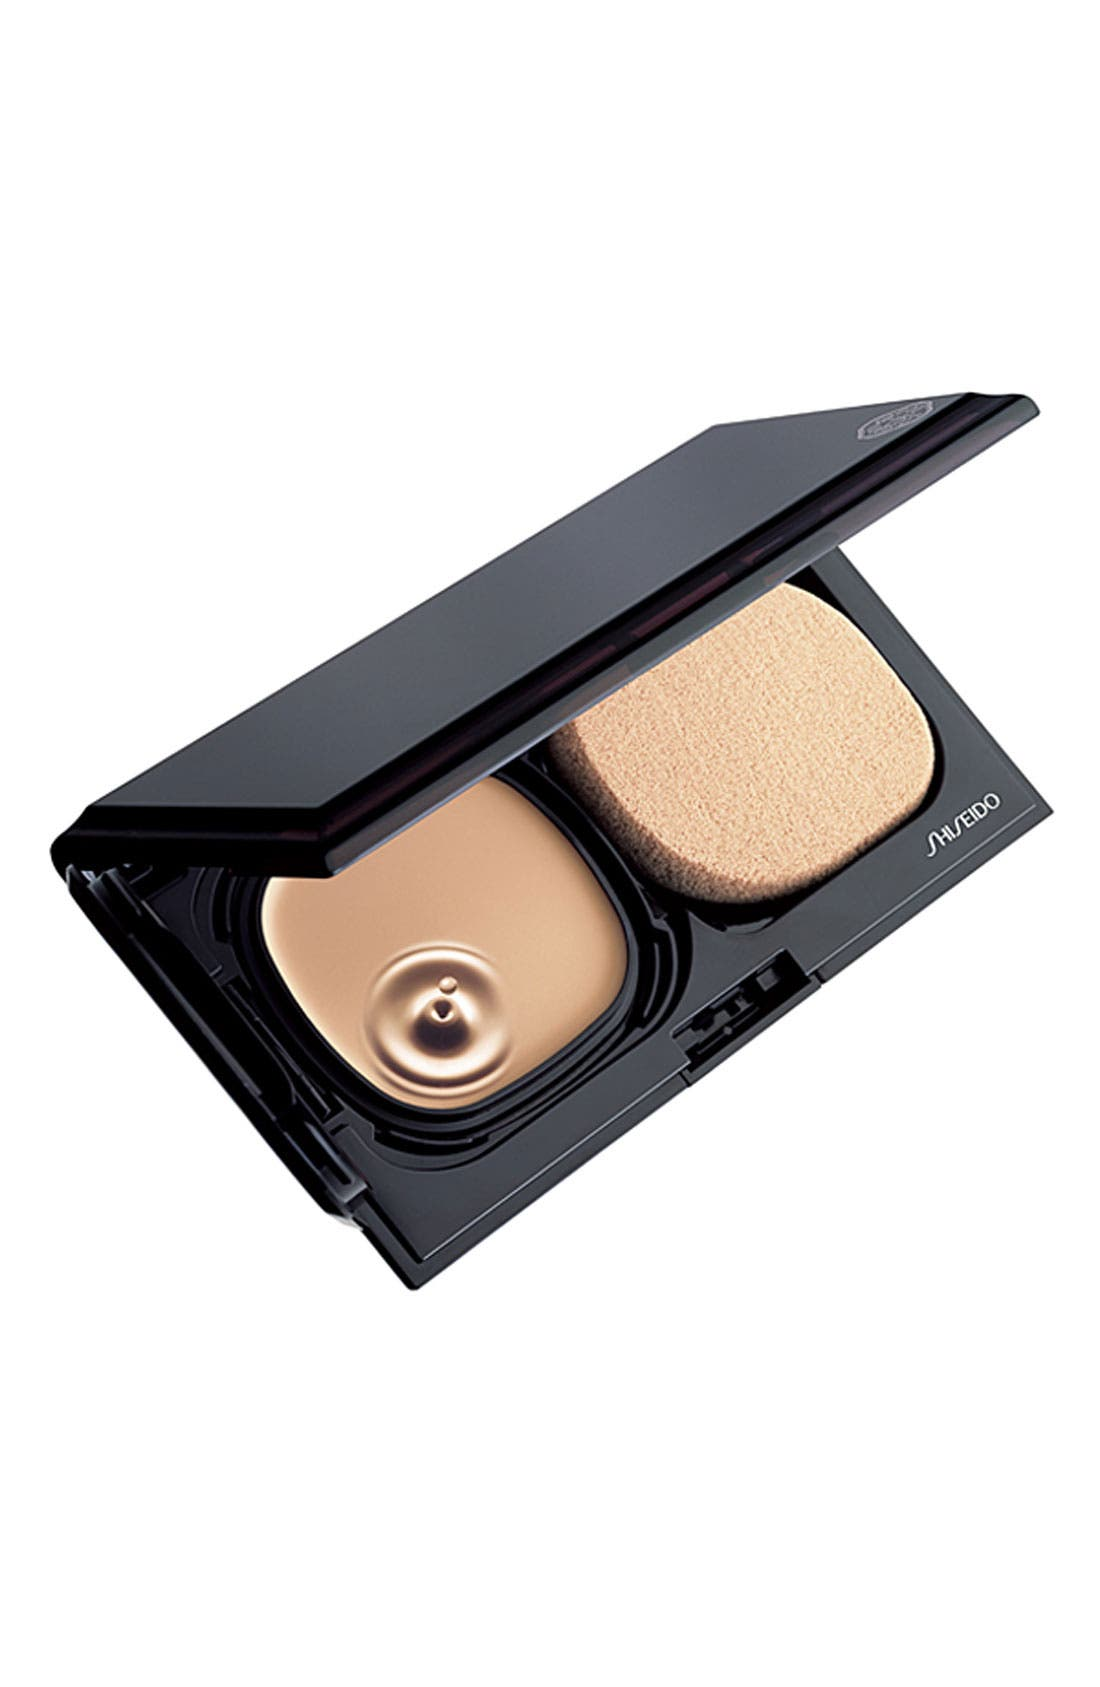 Shiseido 'The Makeup' Advanced Hydro-Liquid Compact SPF 15 Refill